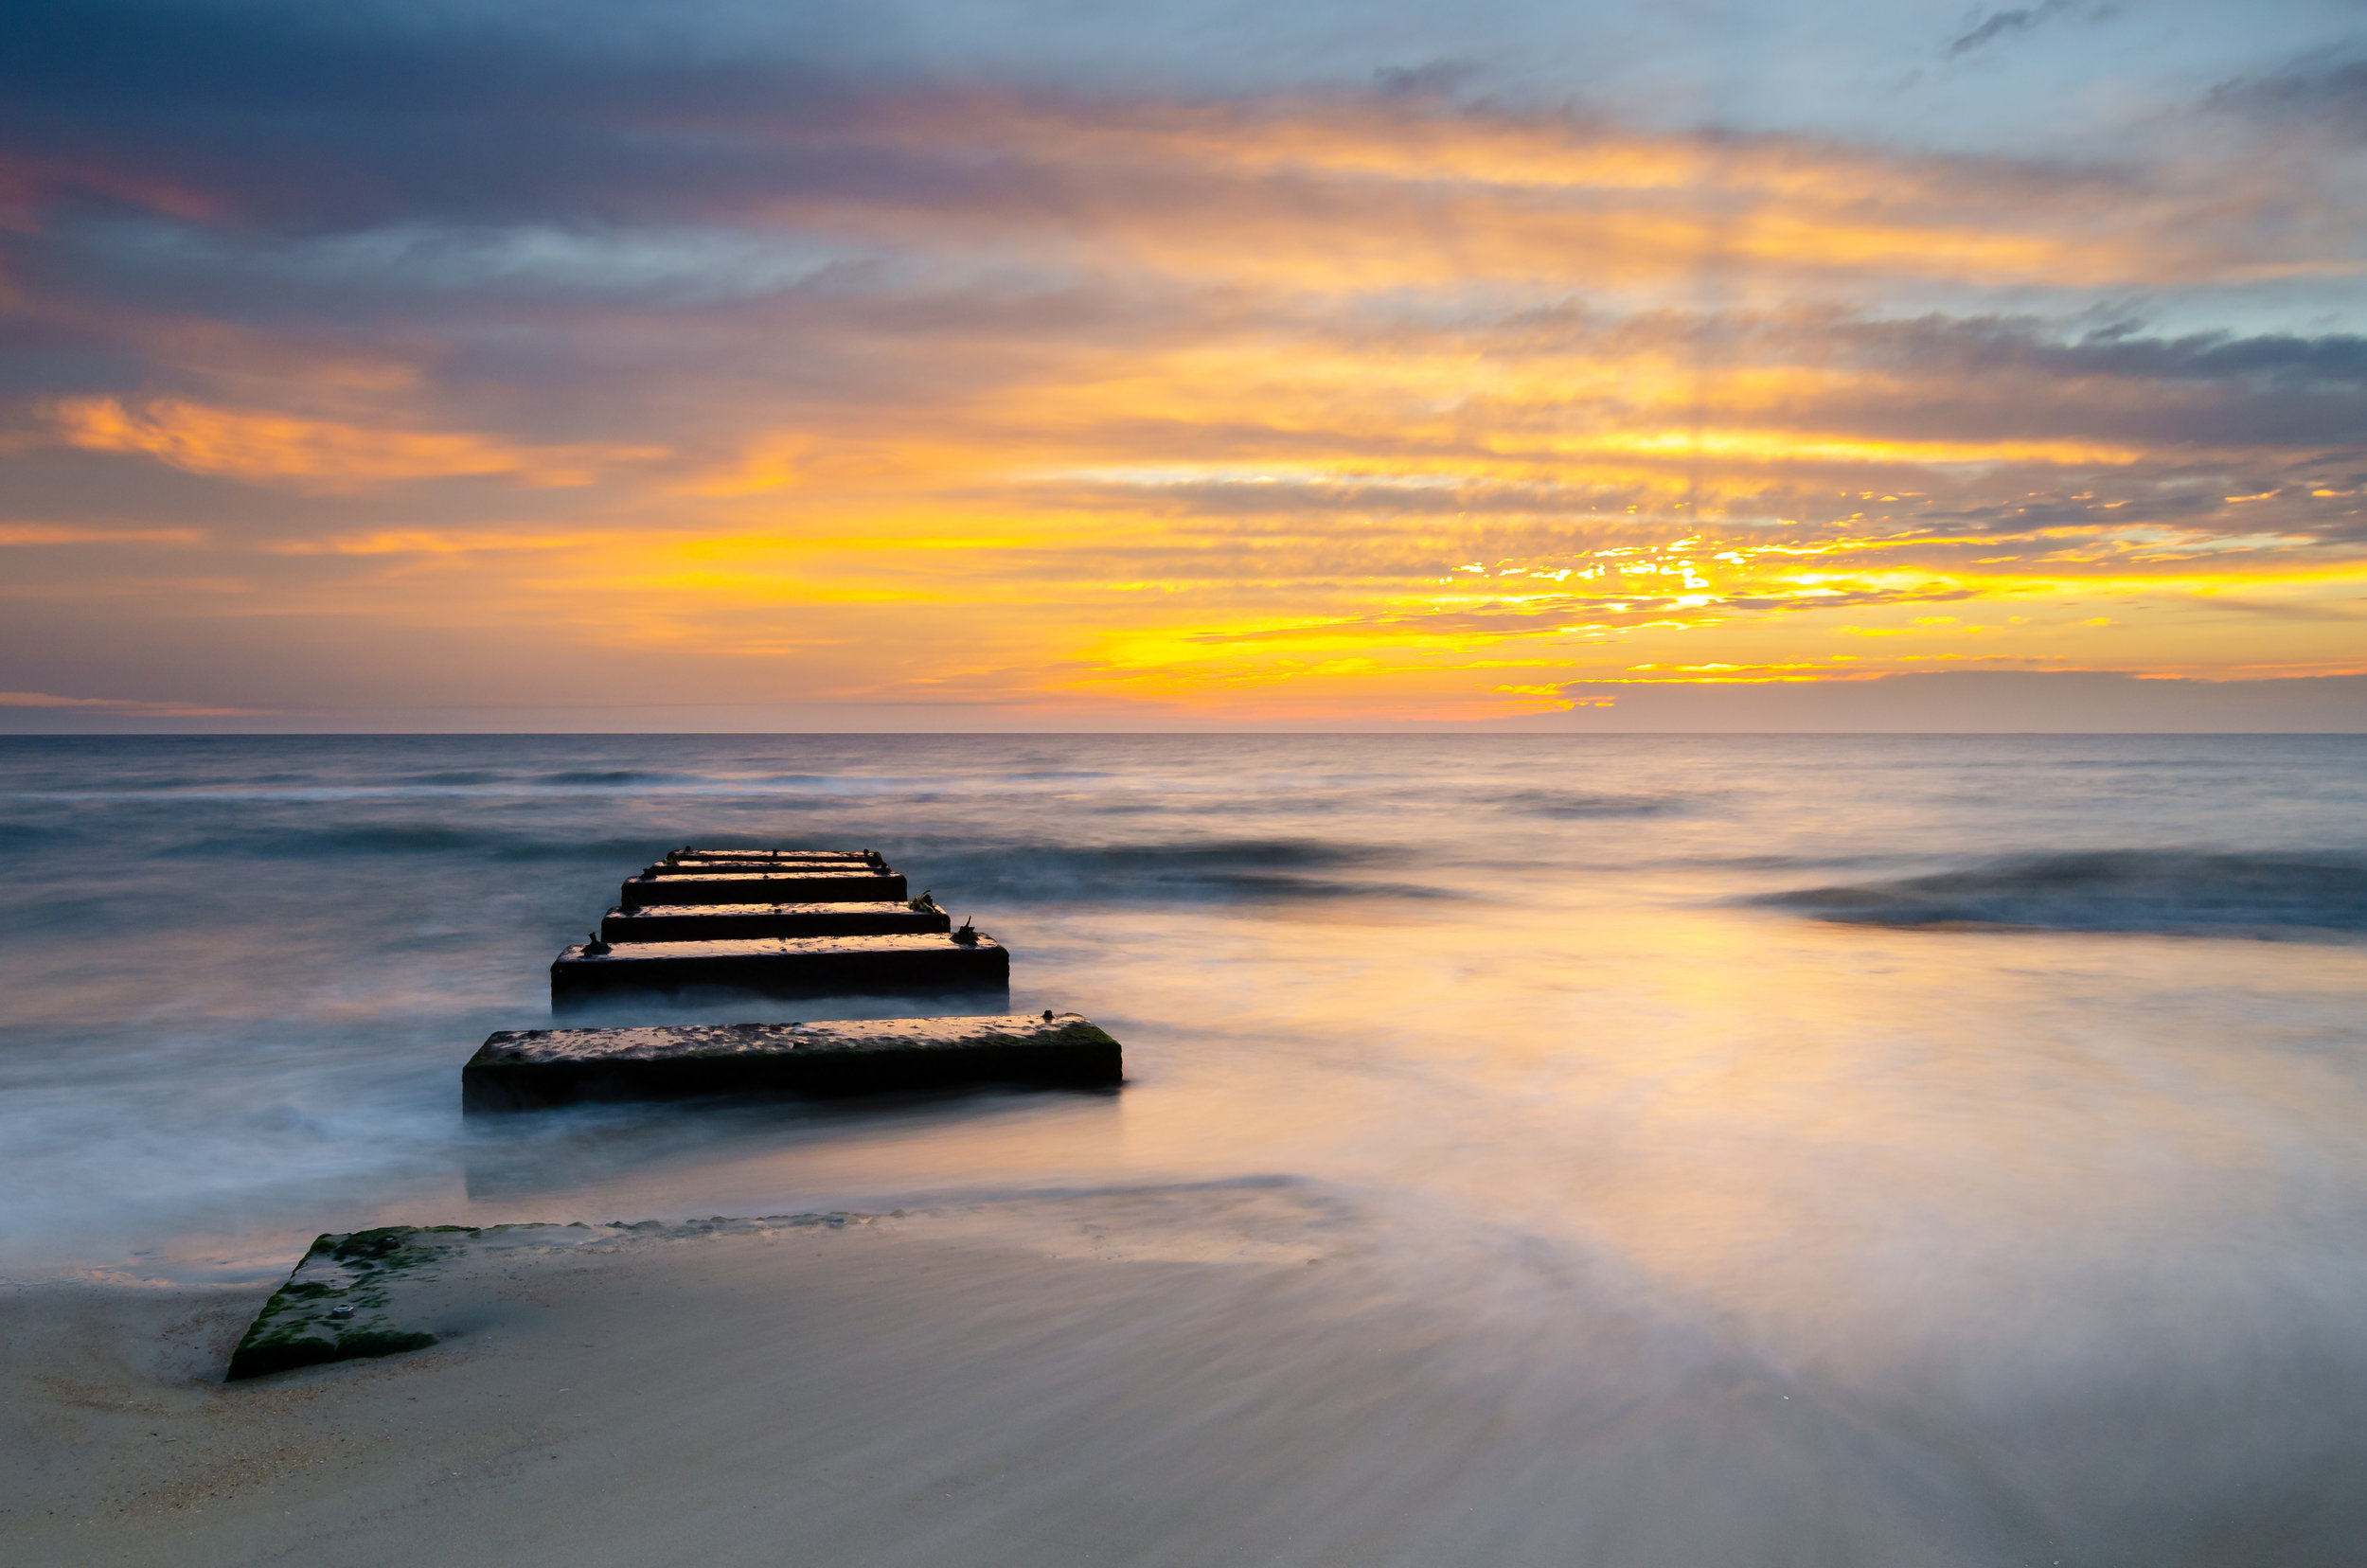 Nags Head-sunrise-blocks-beach-OBX-Outer Banks-North Carolina.jpg